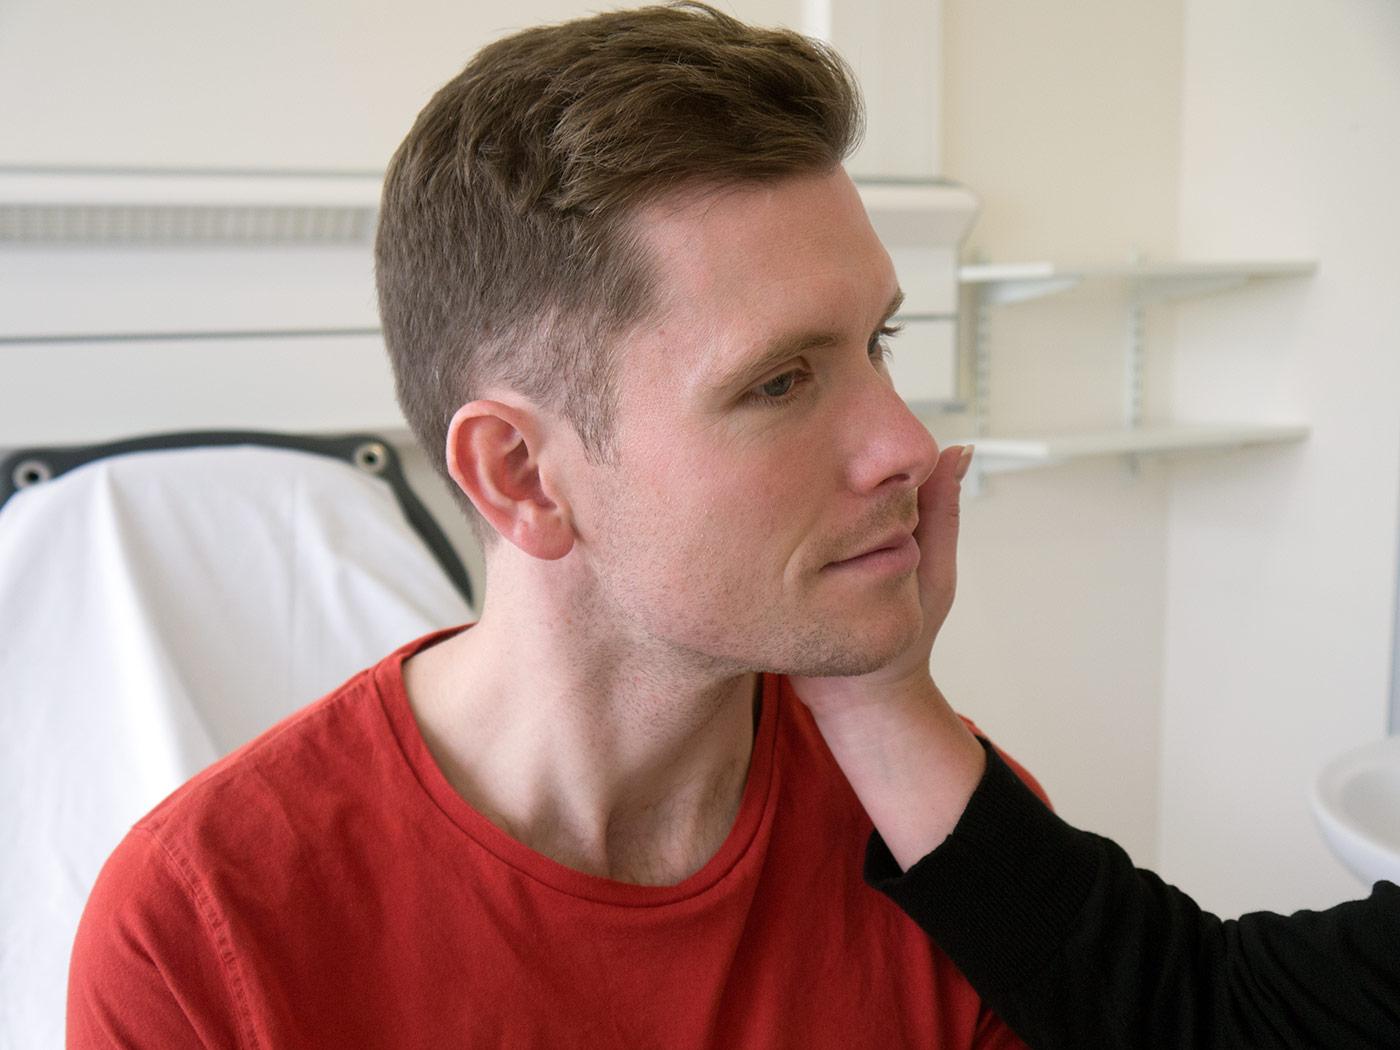 Sternocldeiomastoid muscle test against resistance